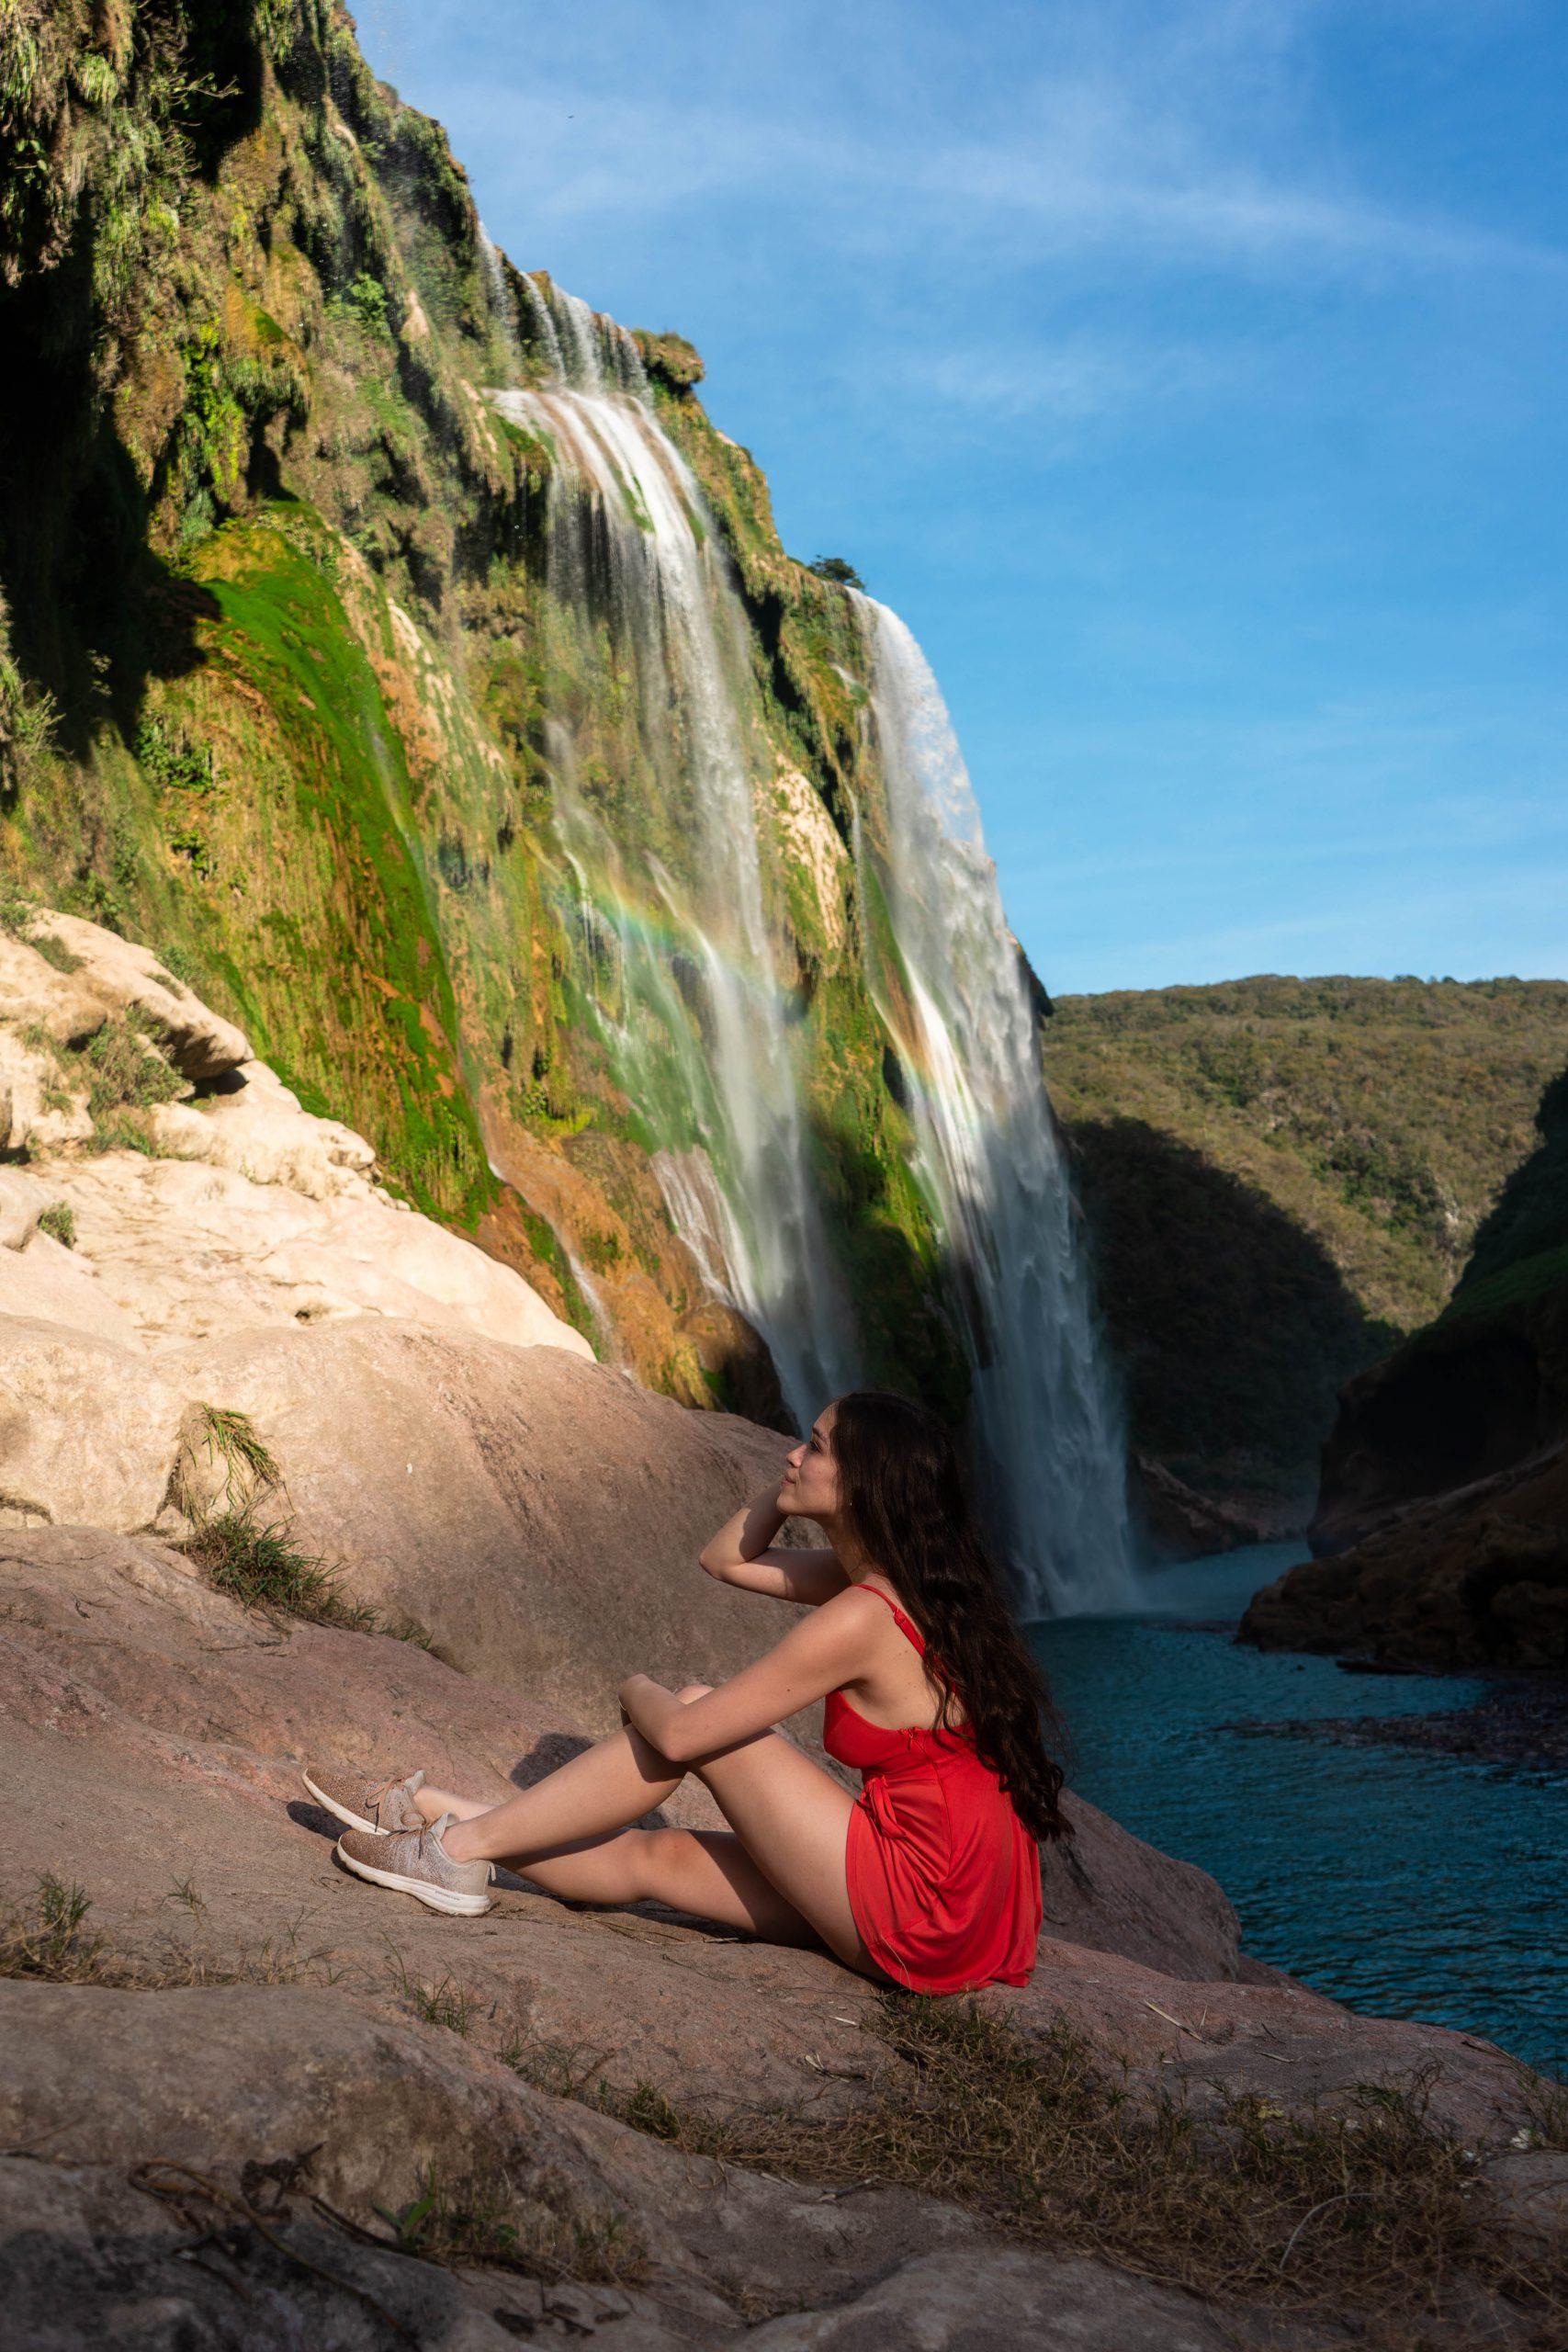 cascada de tamul la huasteca potosina san luis potosi mexico canyon waterfall rainforest apl techloom pro sneaker long brunette hair curled eva phan hiking